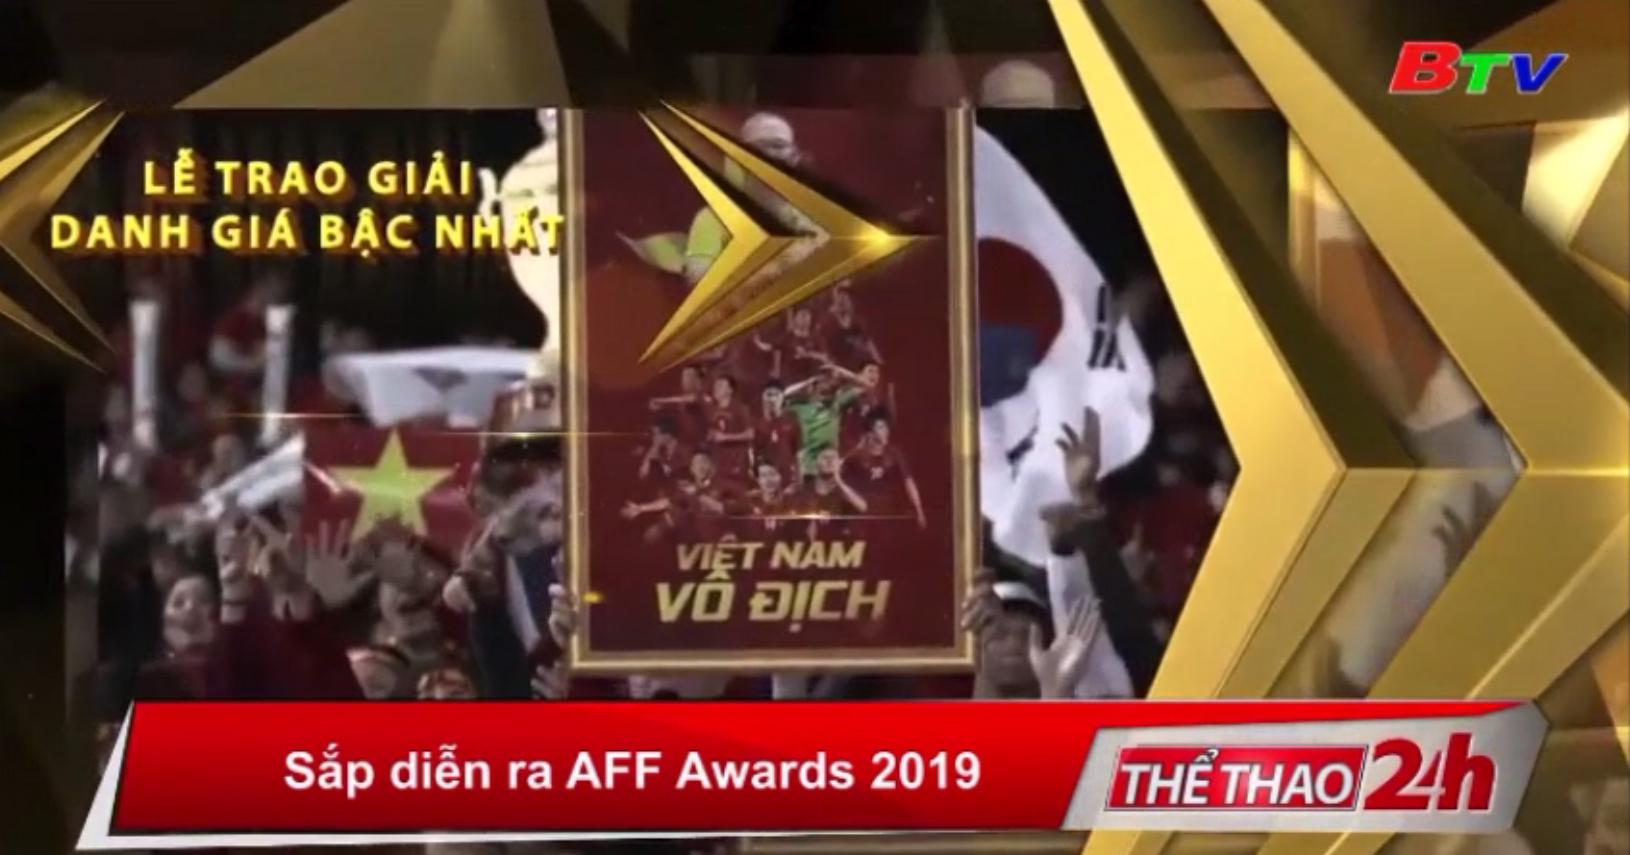 Sắp diễn ra AFF Awards 2019